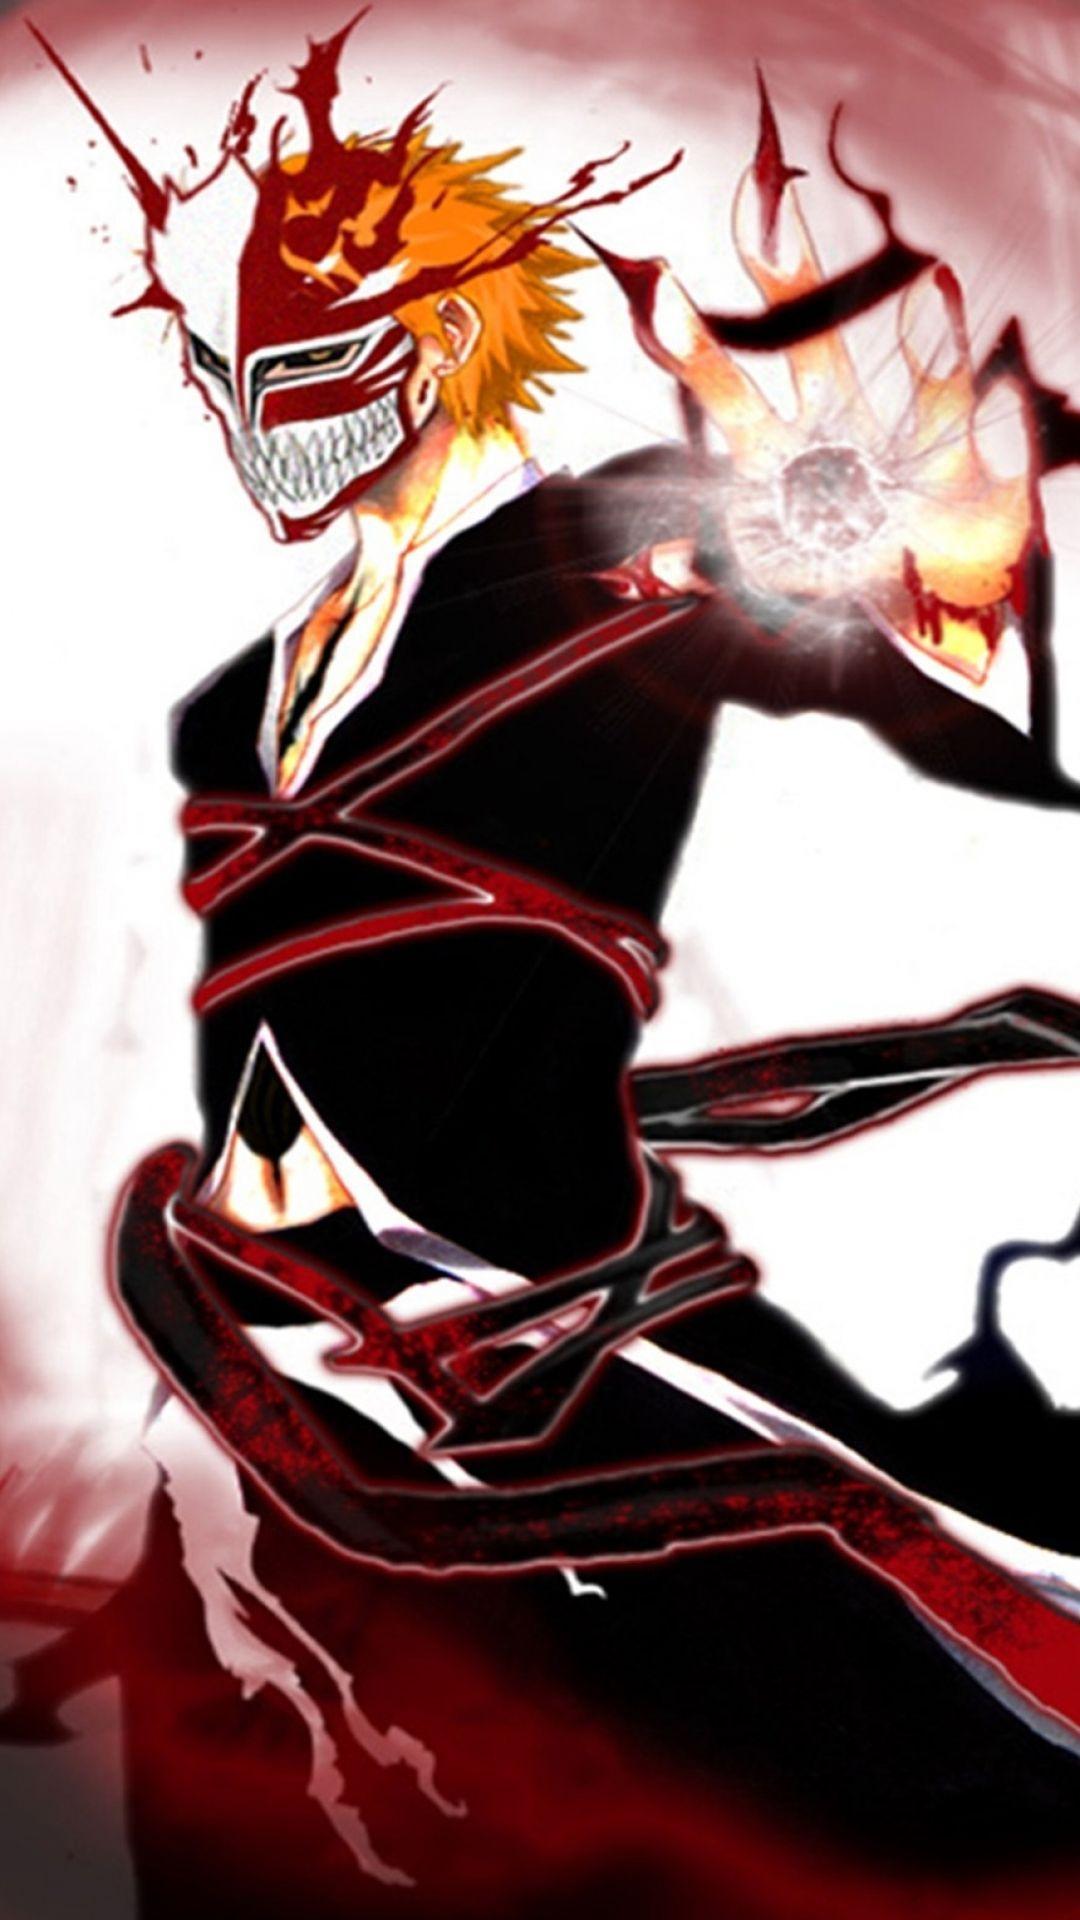 Bleach Anime Blogspot Bleach Anime Bleach Anime Ichigo Bleach Characters